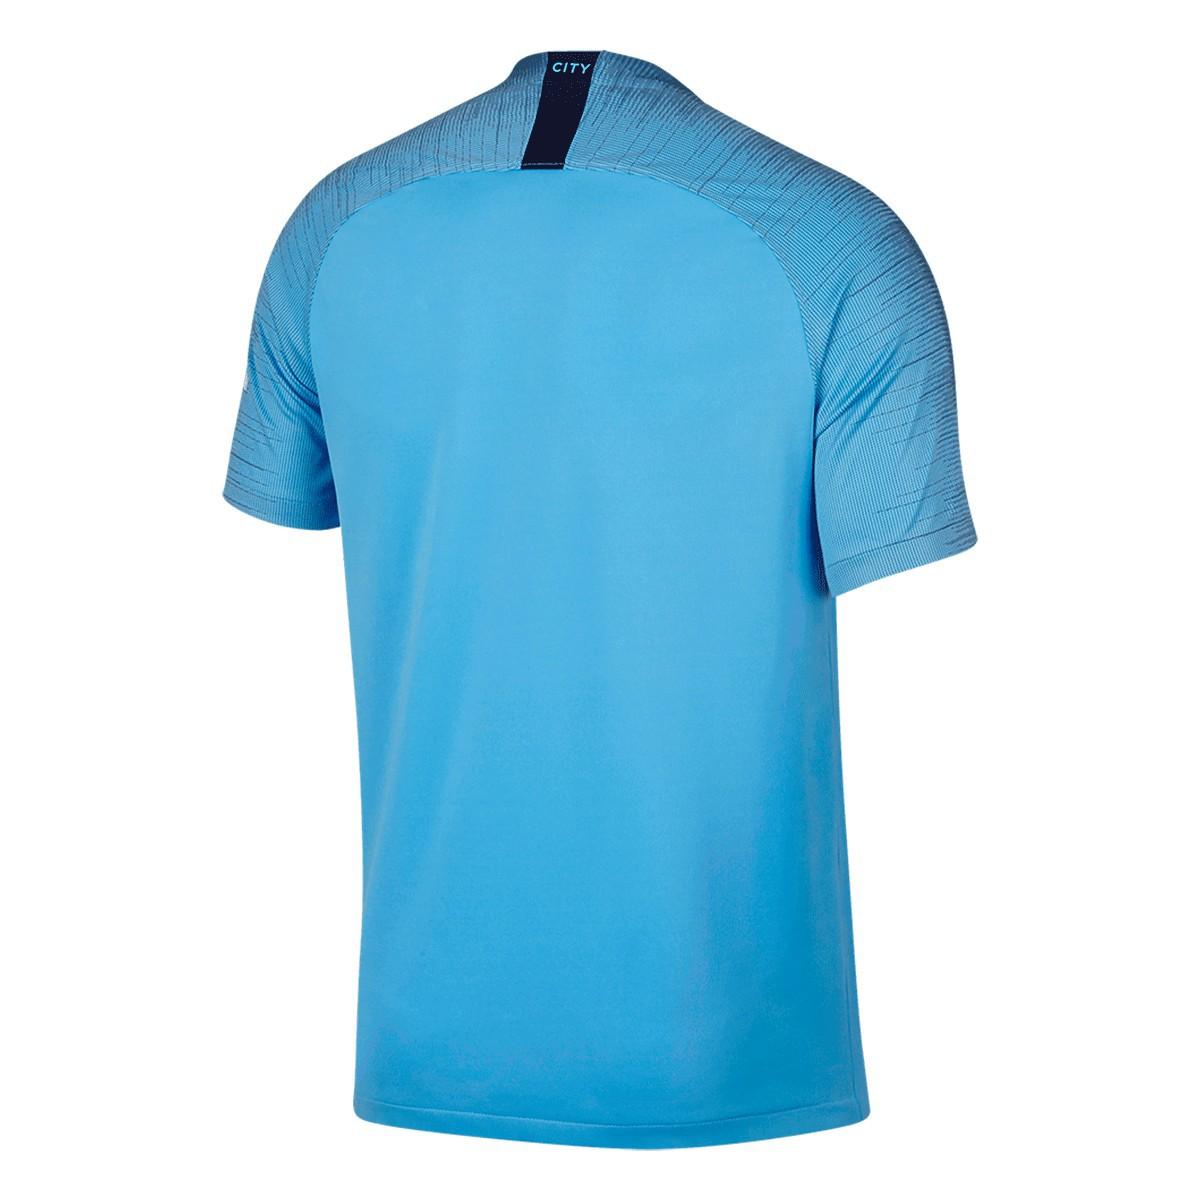 Camisa Manchester City Nike Home 18 19 Torcedor SN